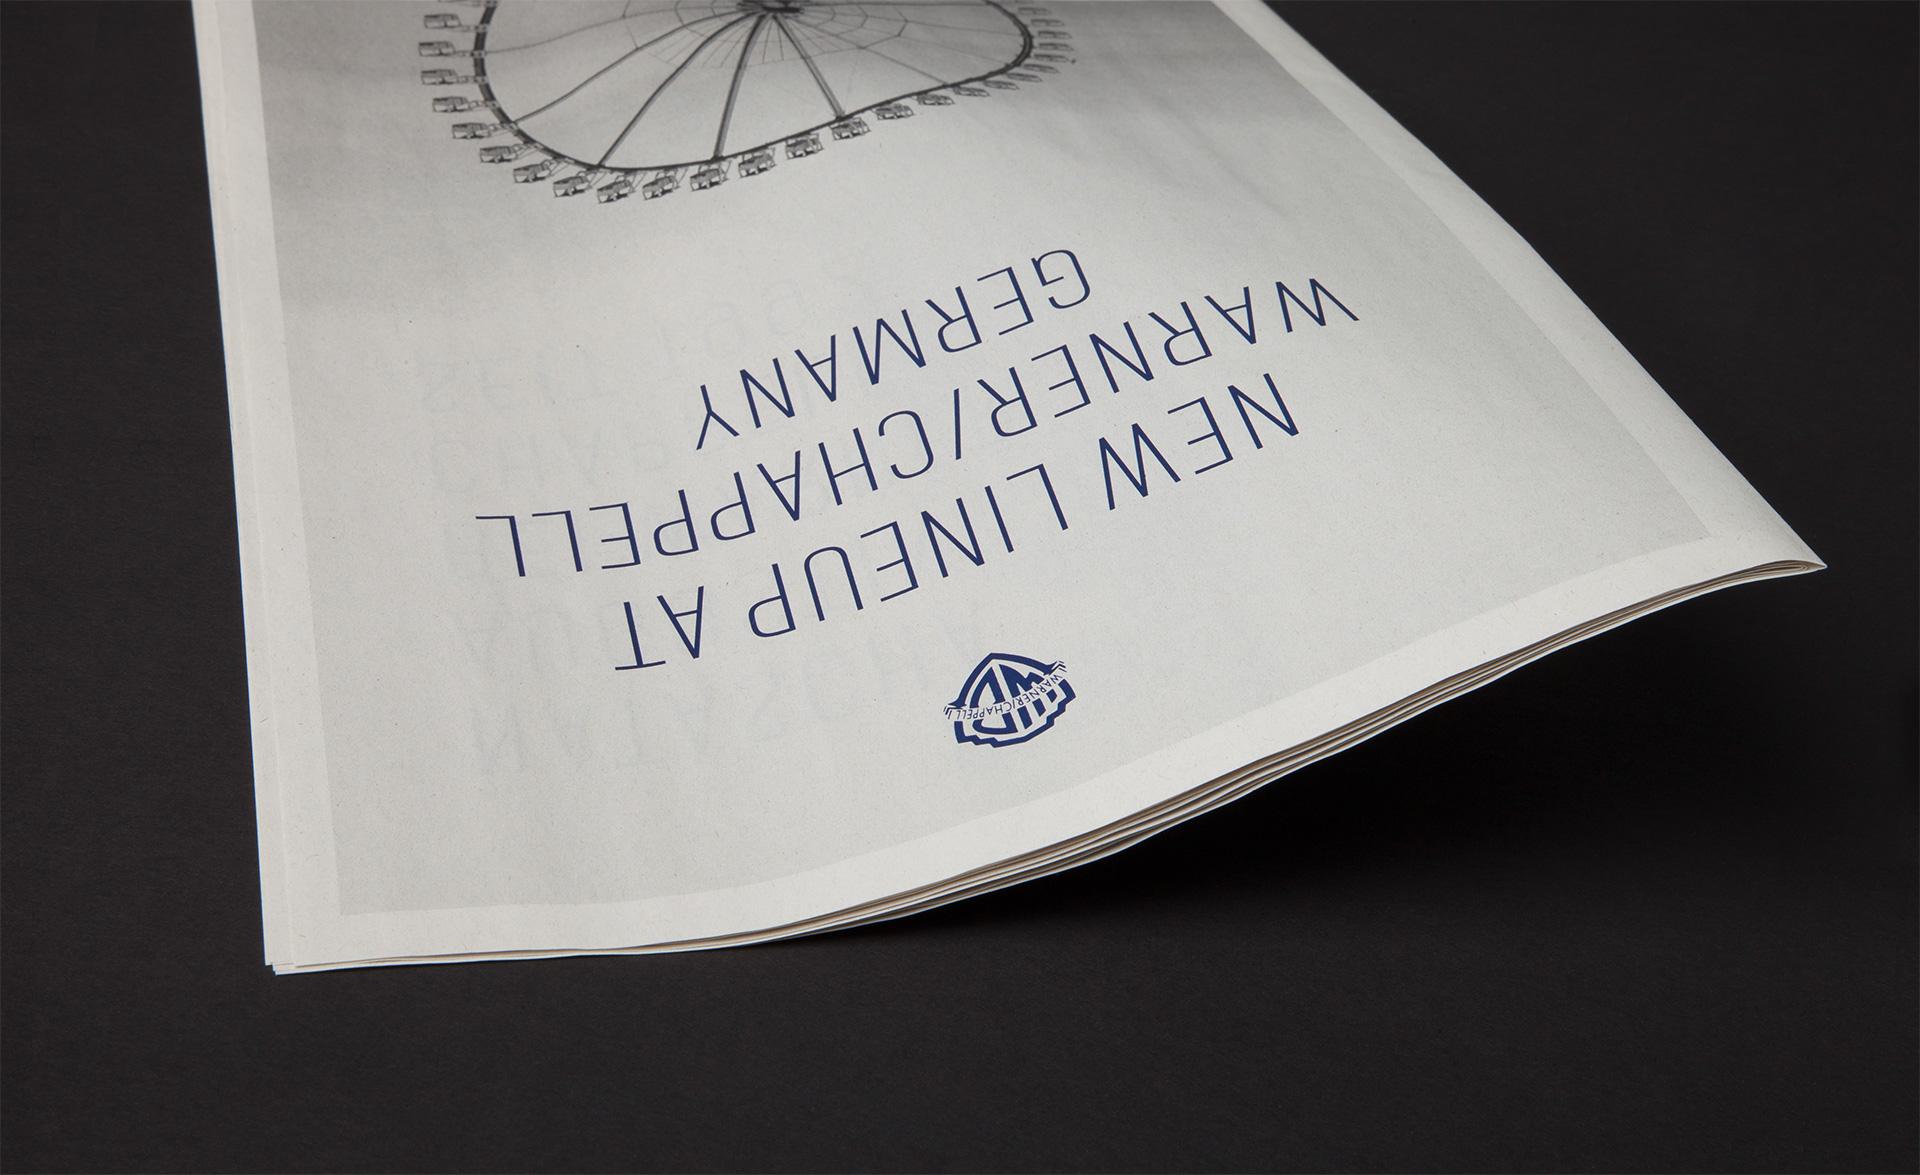 WCM_Paper_Fullscreen_1b